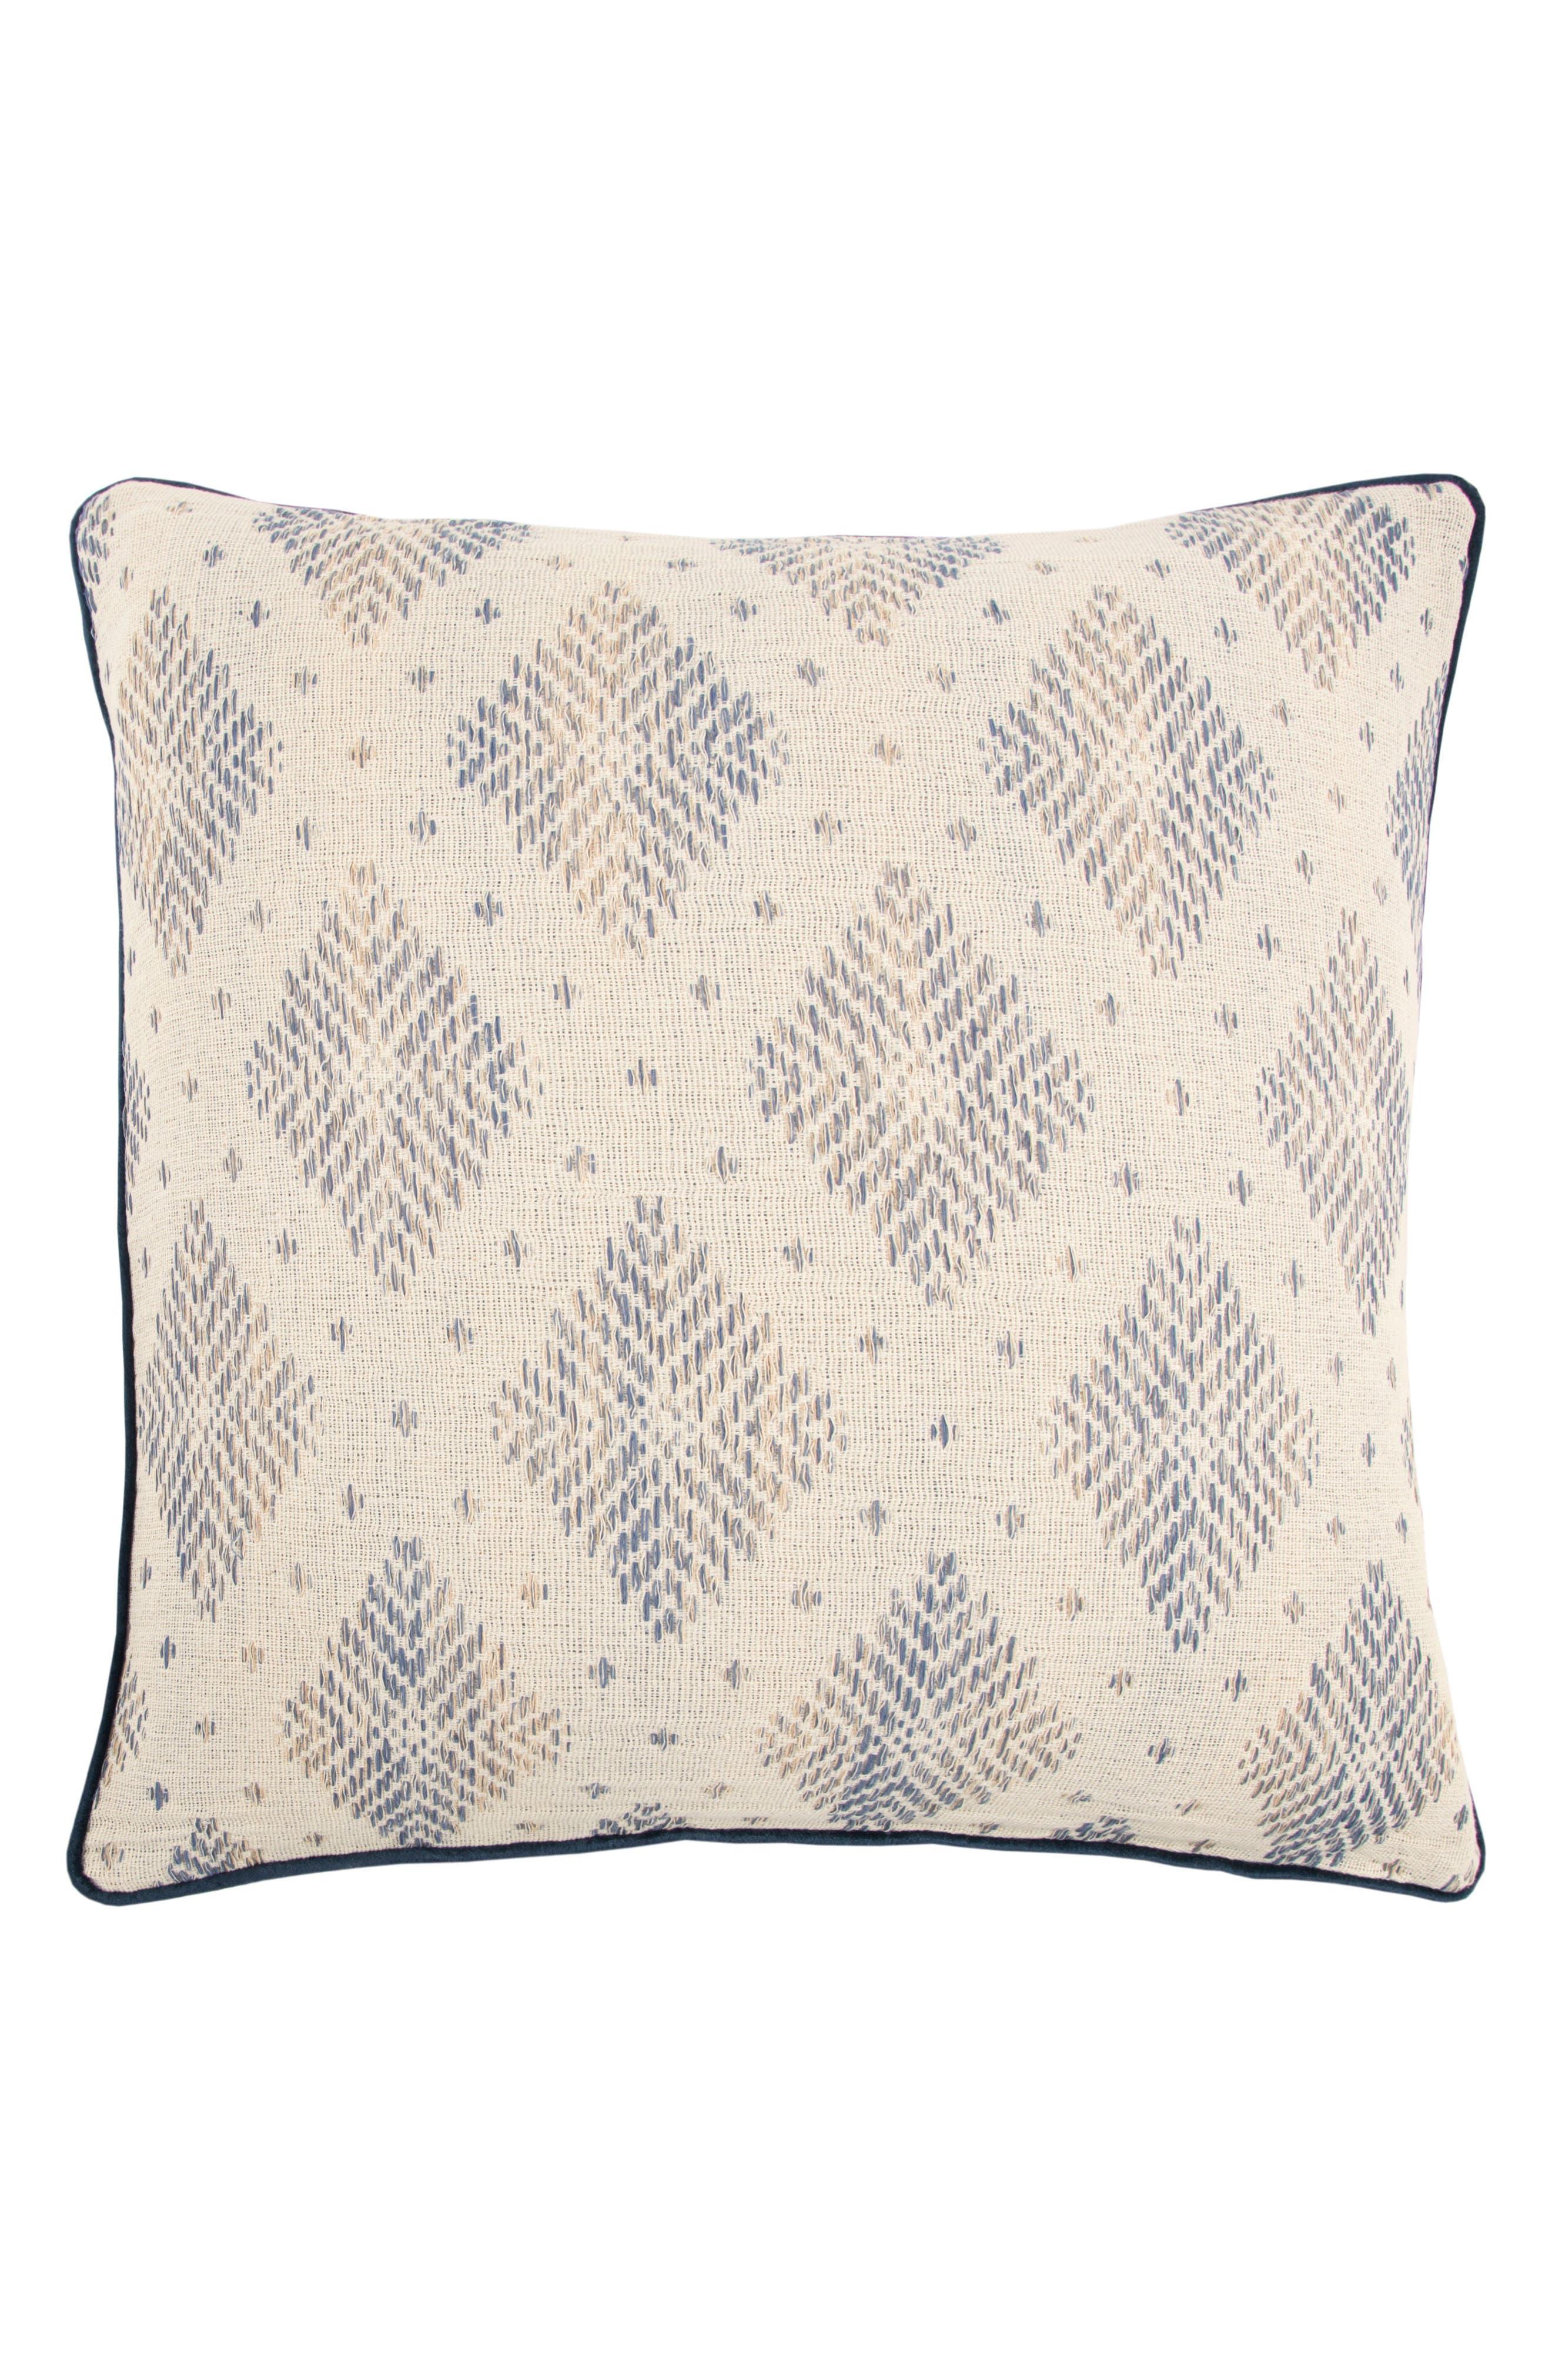 Woven Diamond Accent Pillow,                             Main thumbnail 1, color,